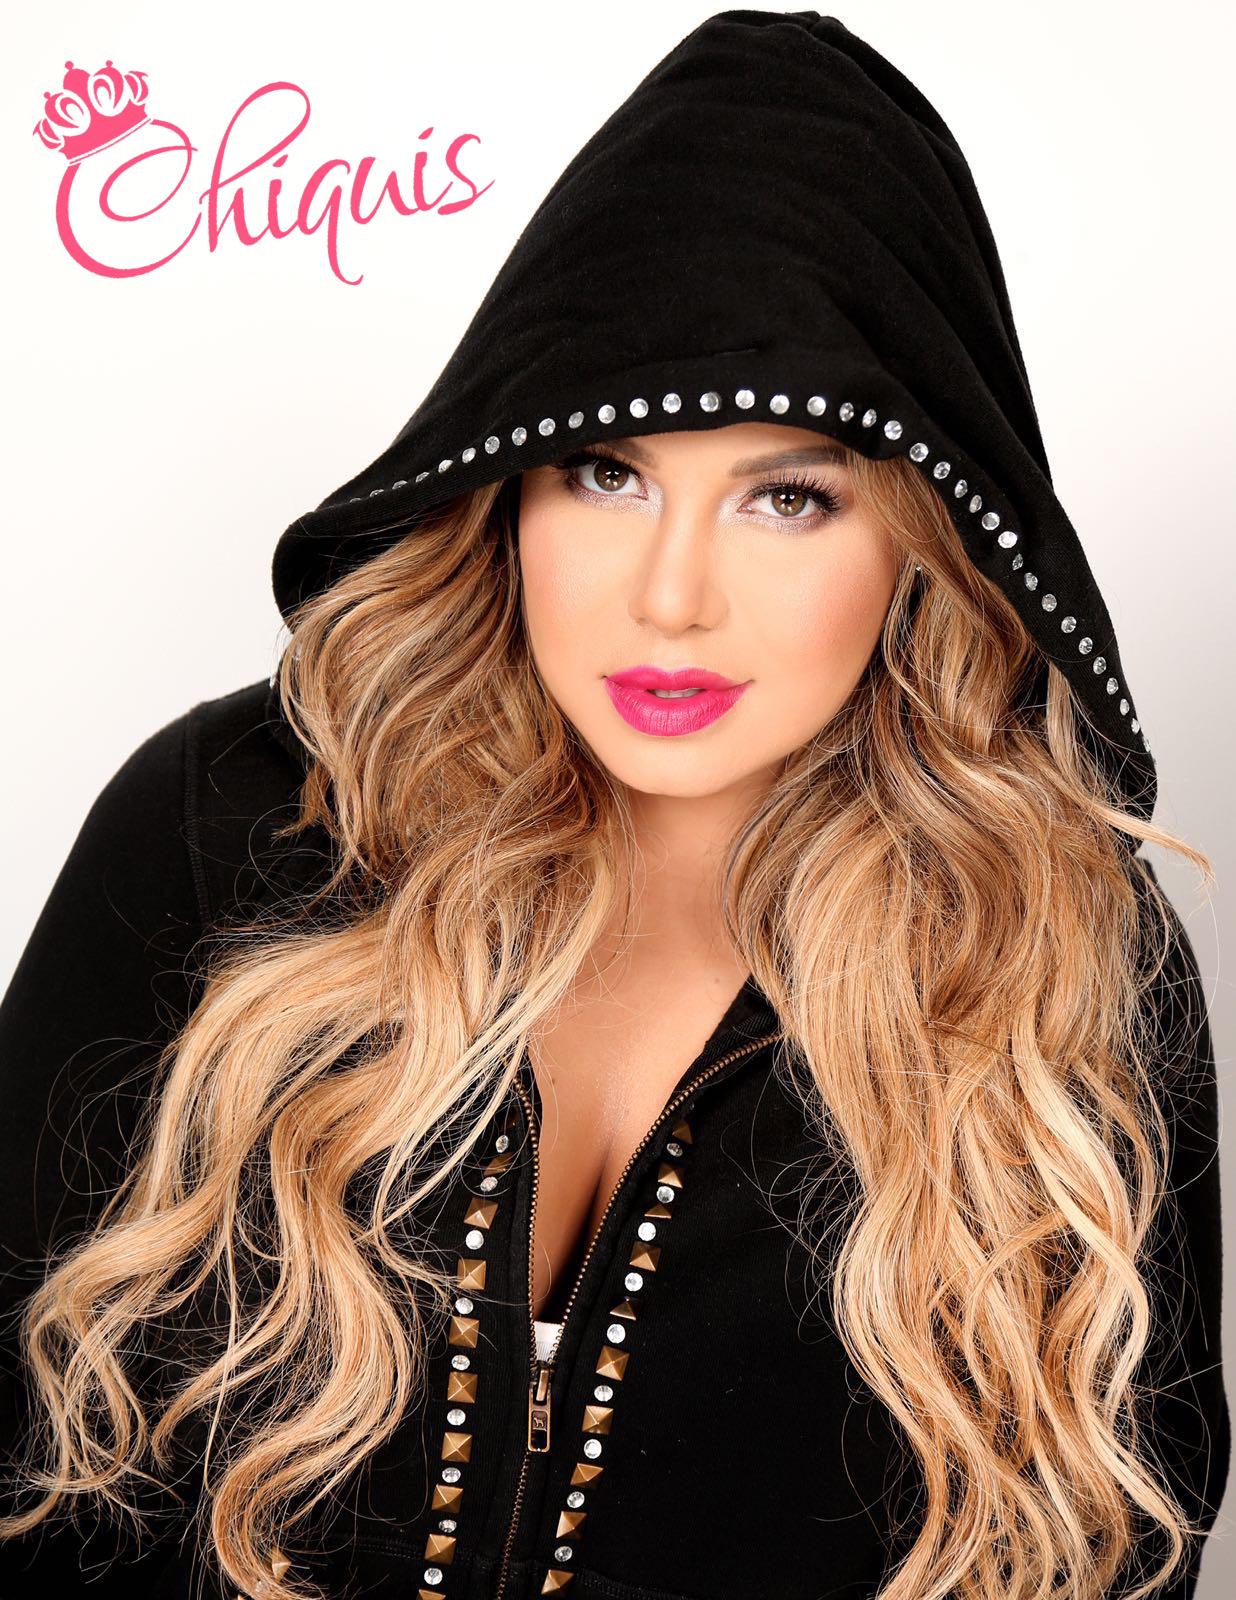 Chiquis Online Store Chiquis Rivera Poster